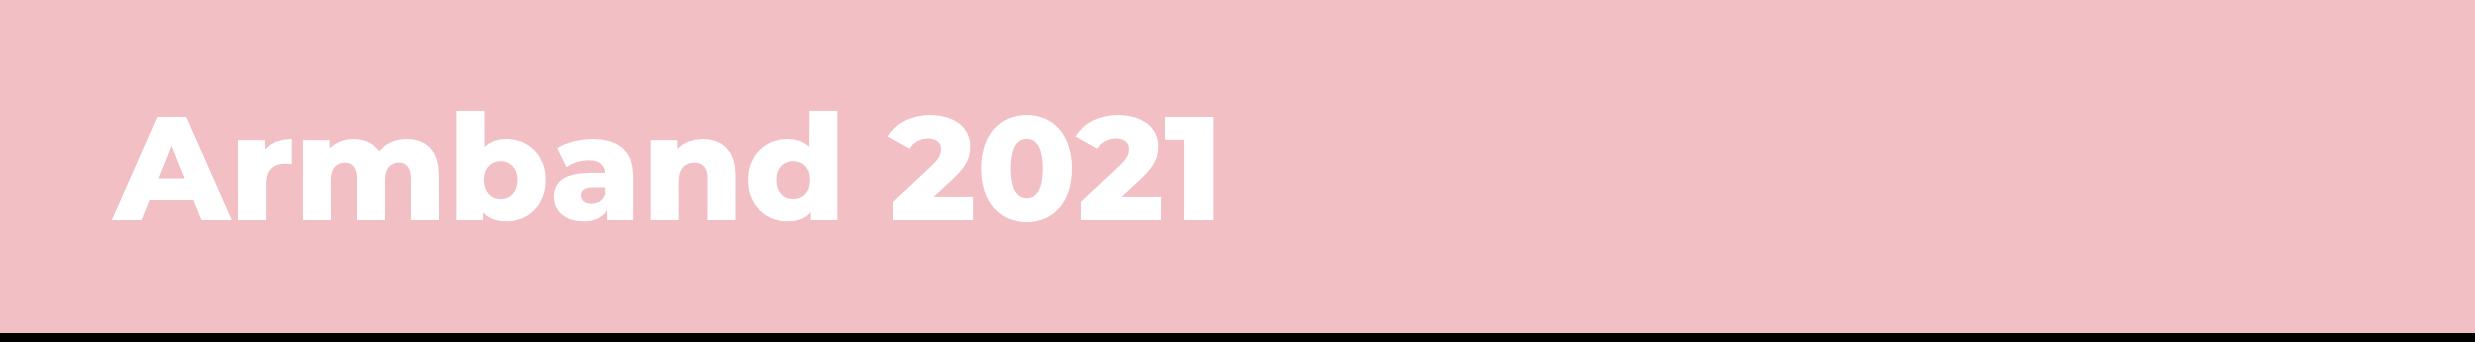 Armband 2021